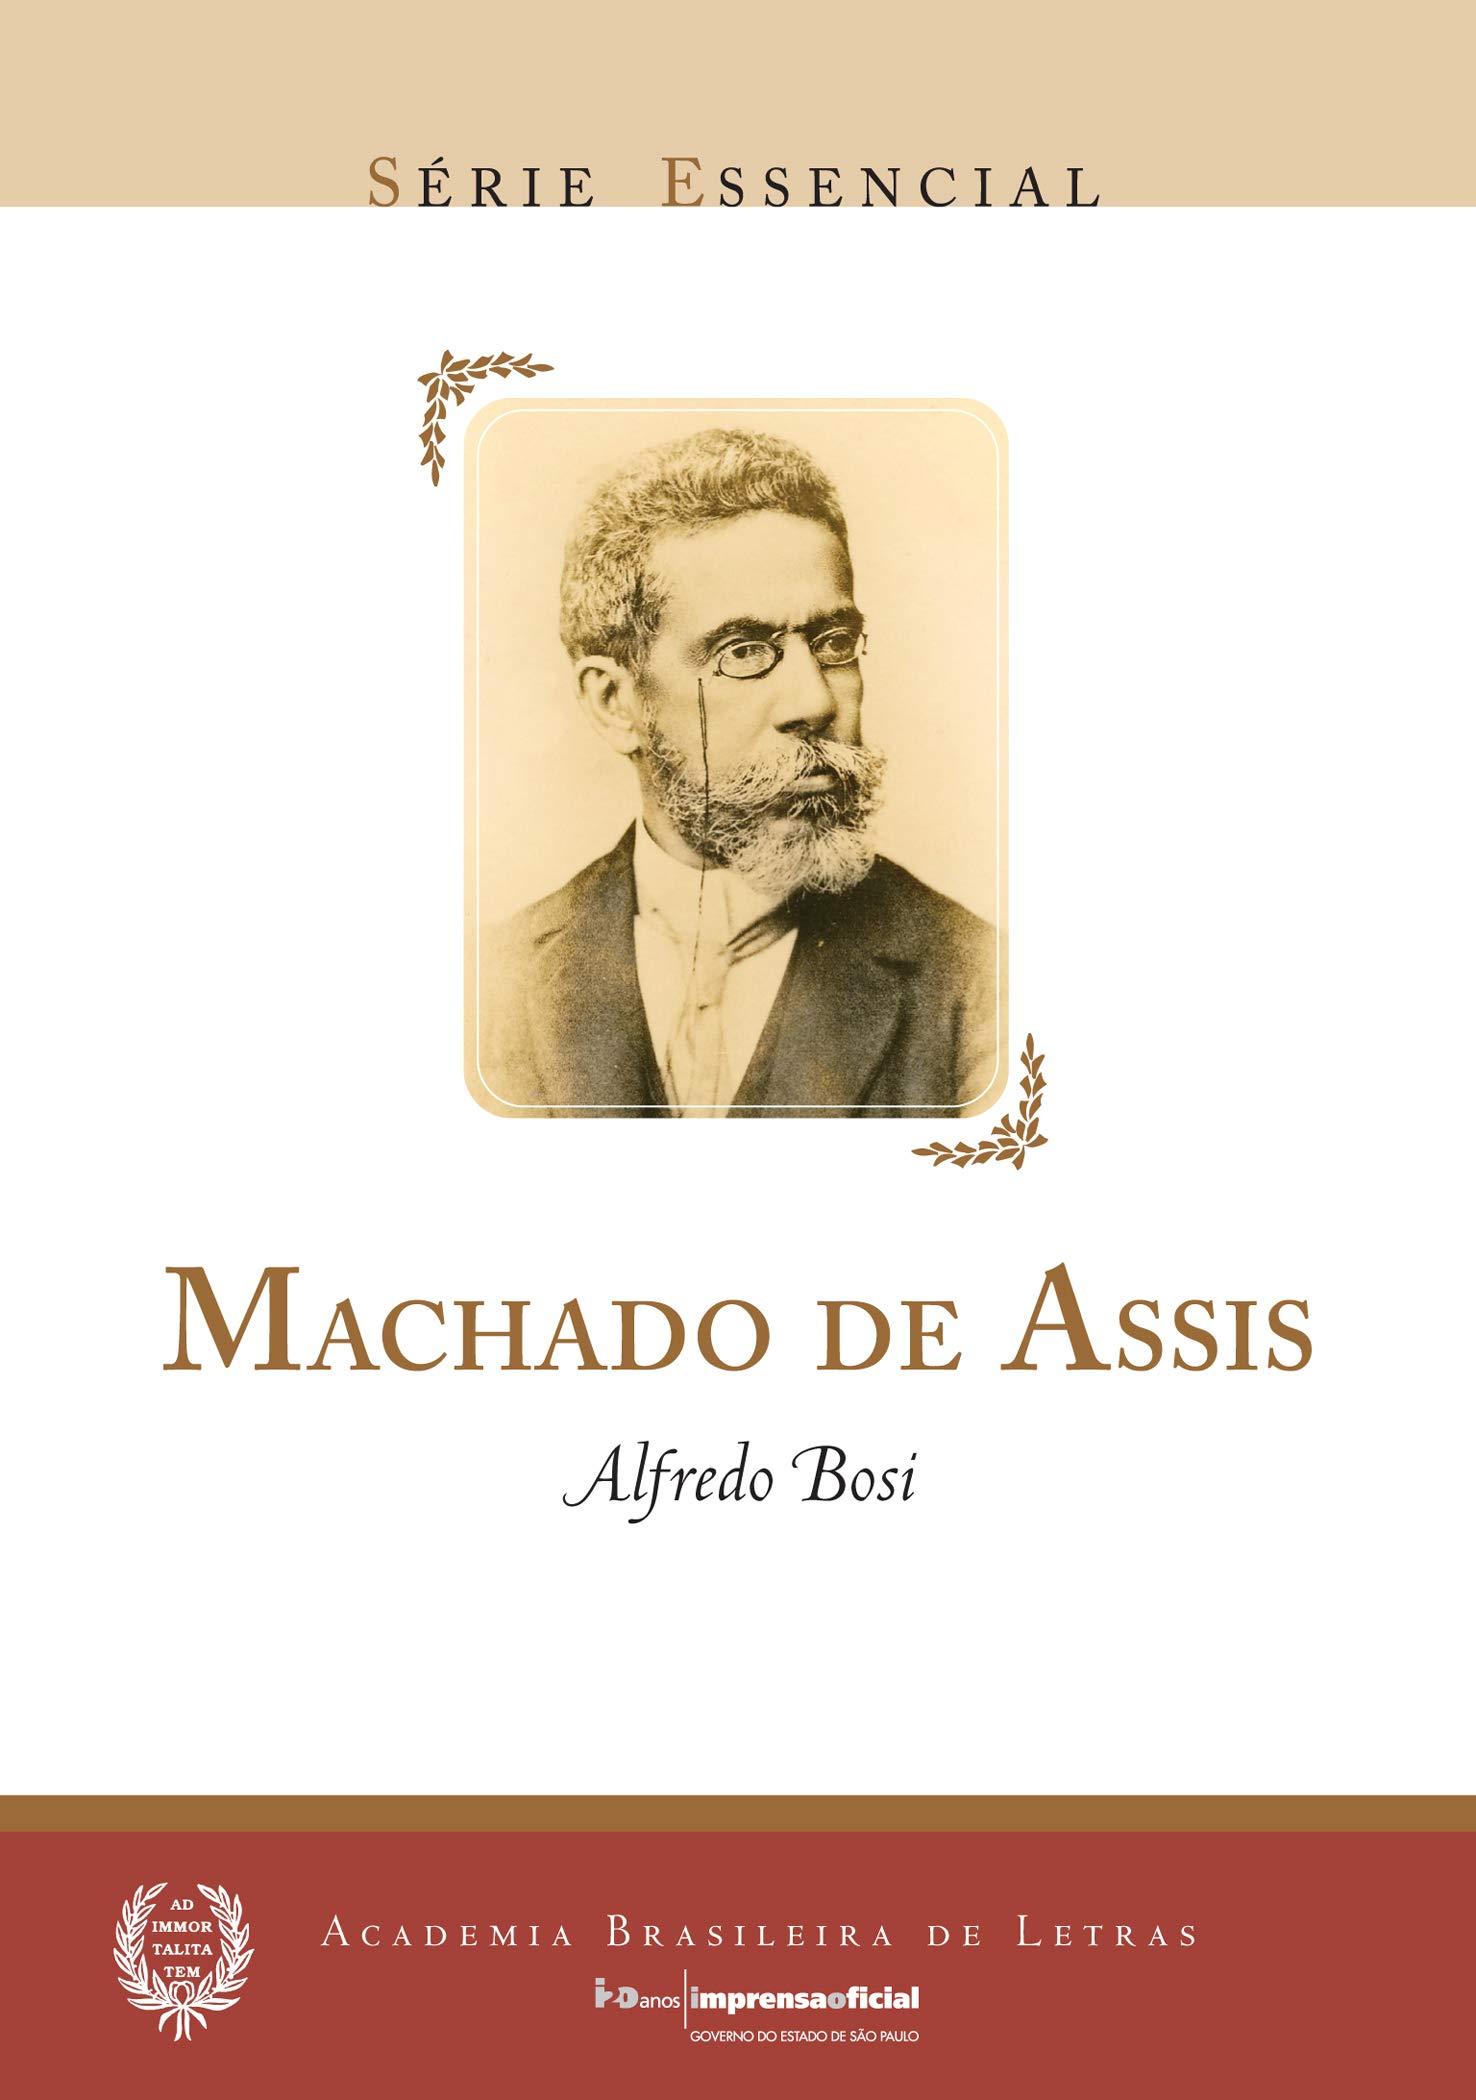 Machado de Assis, livro de Alfredo Bosi